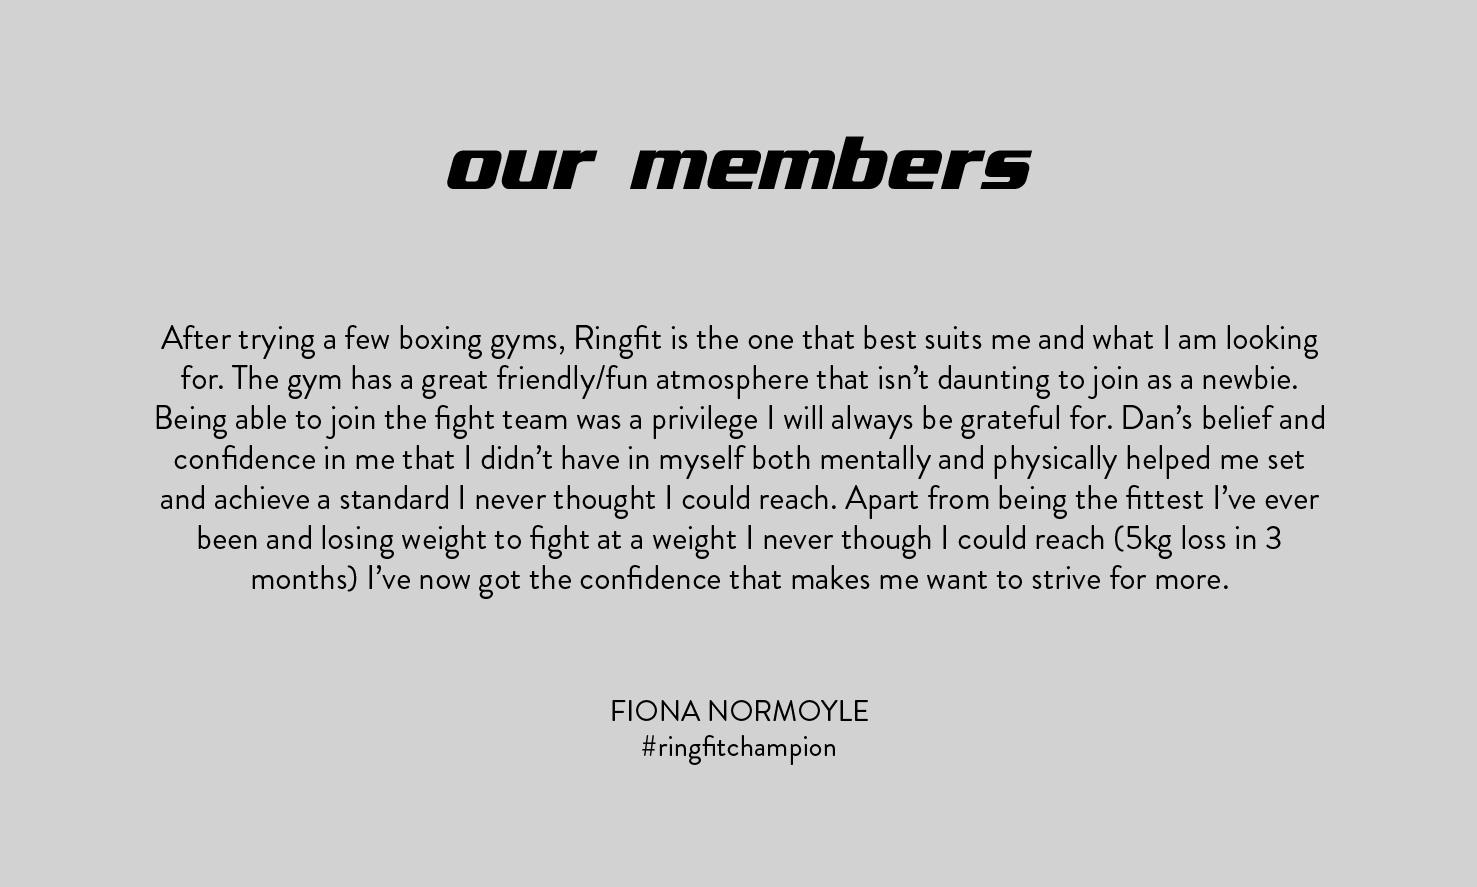 Members_Fiona Normoyle-04.jpg